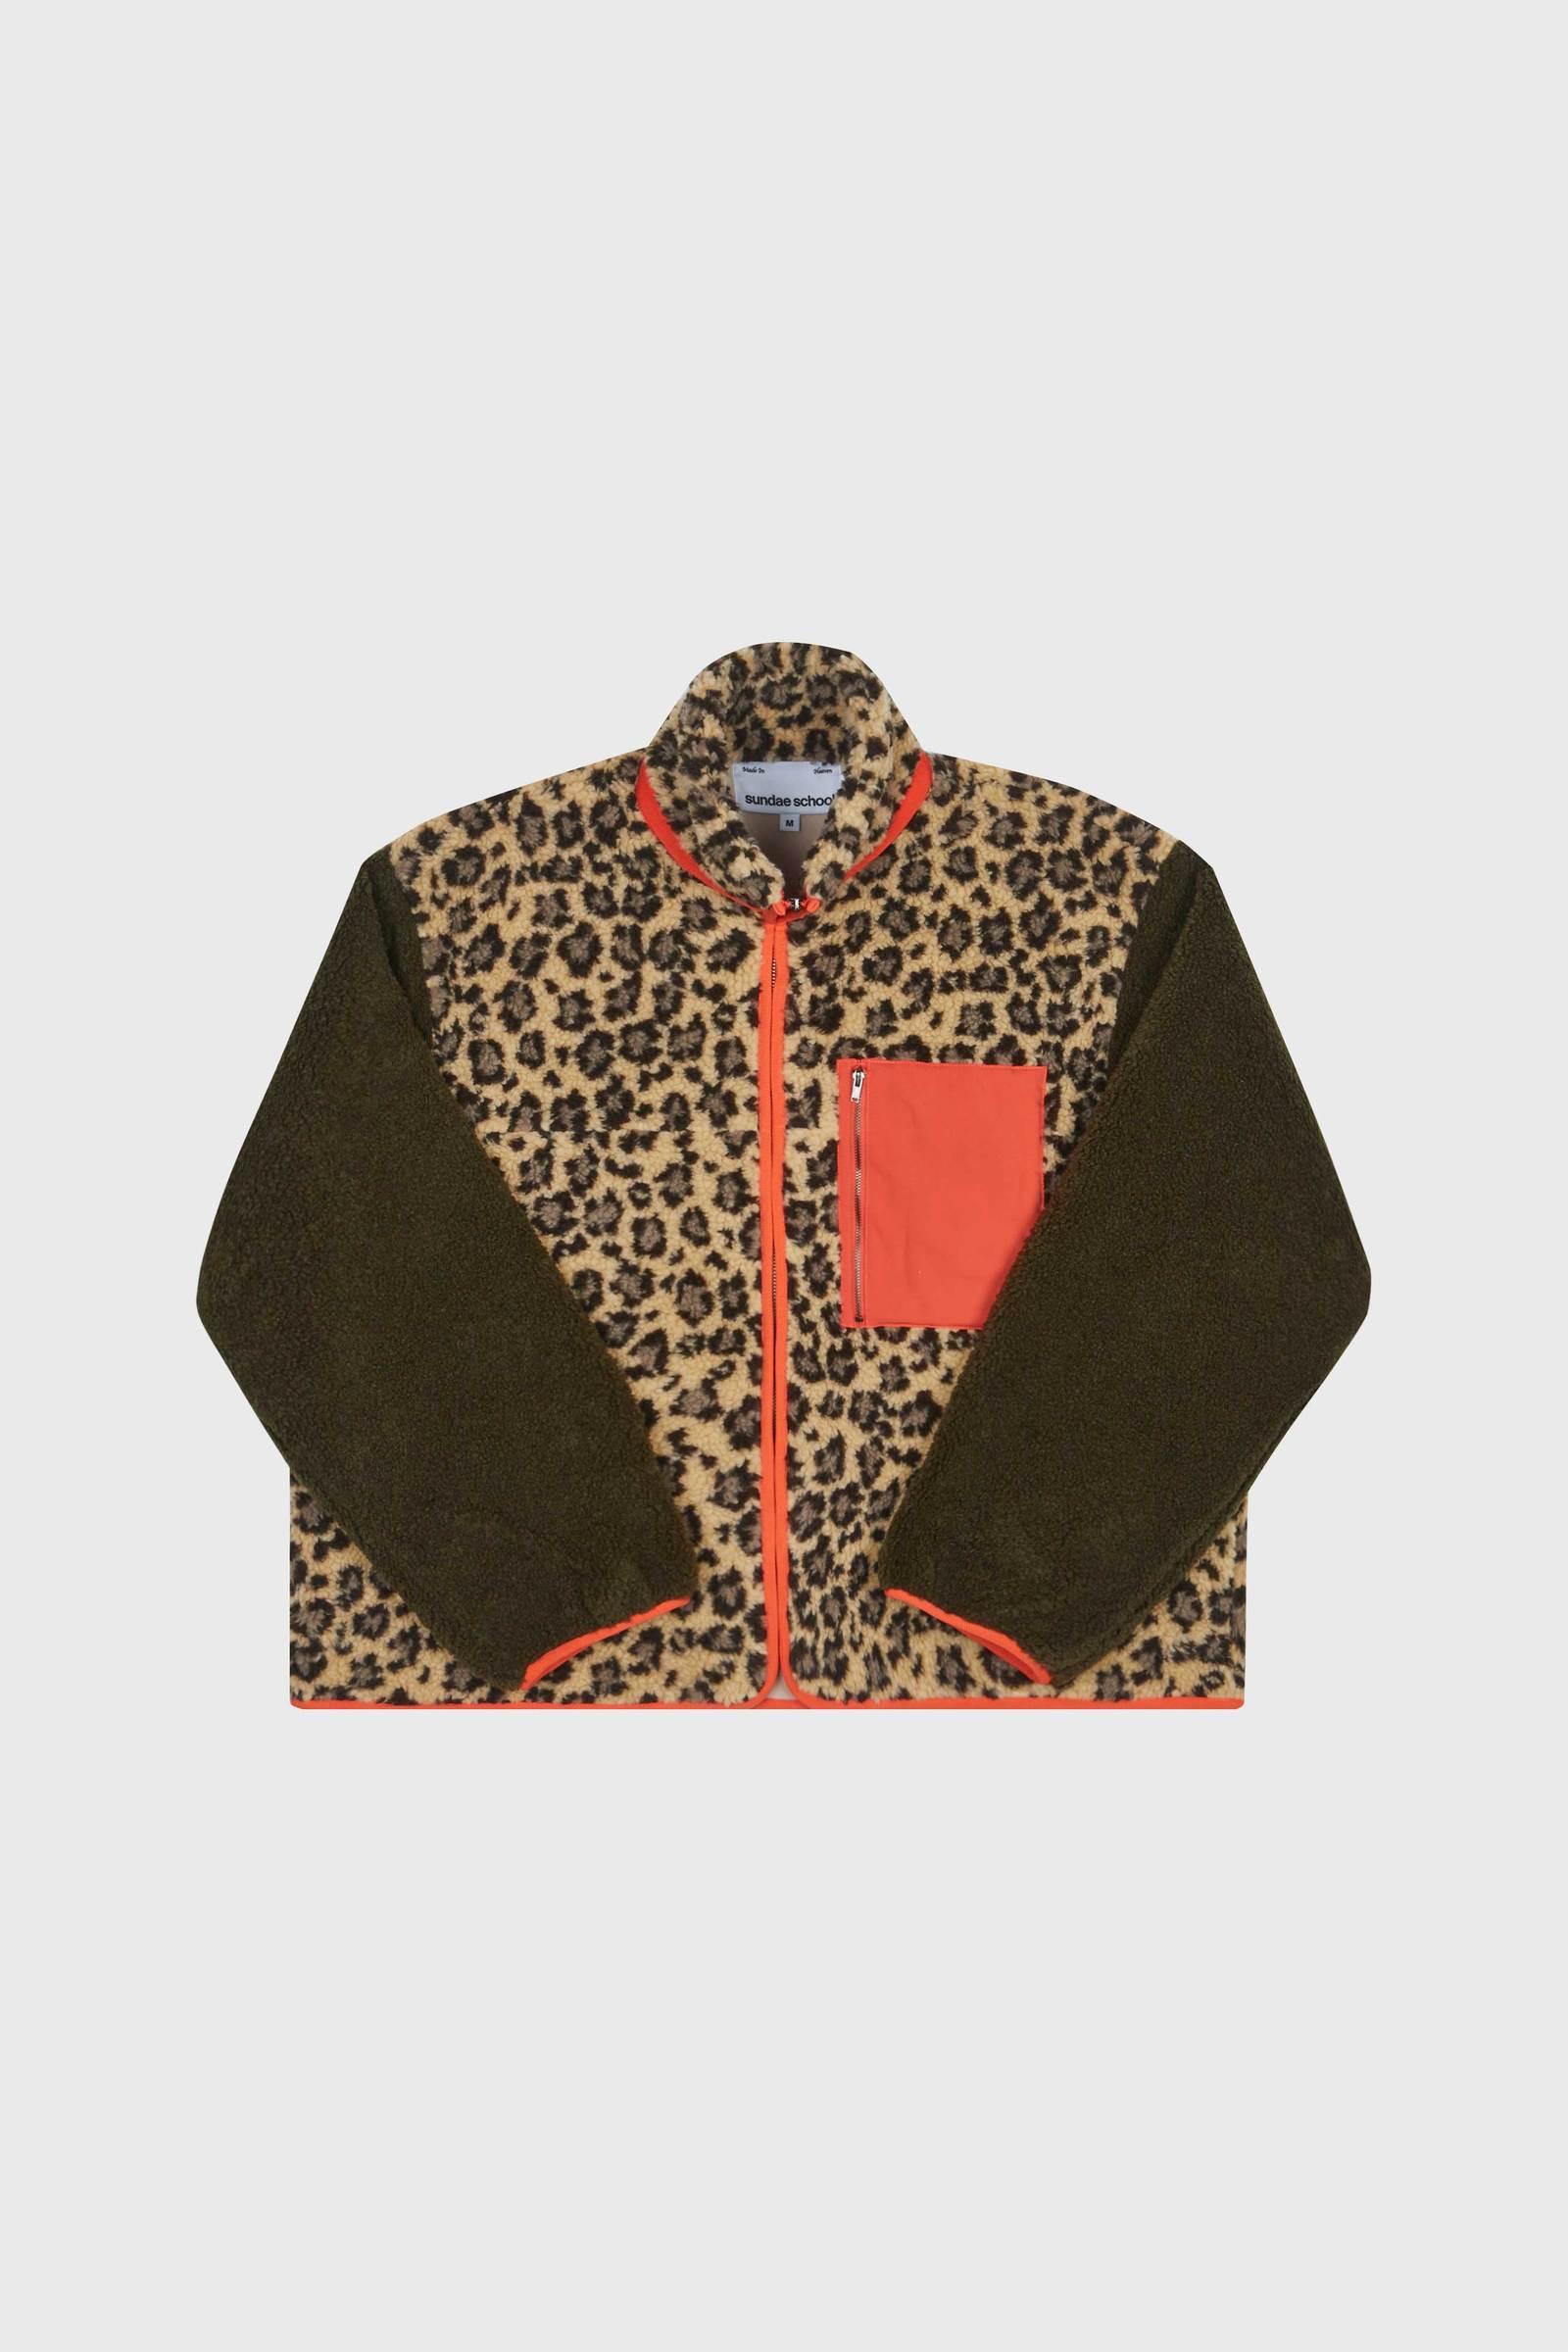 Tiger Mom Leopard Fleece Zip Up by Sundae School, available on sundae.school for $255 Kaia Gerber Outerwear Exact Product